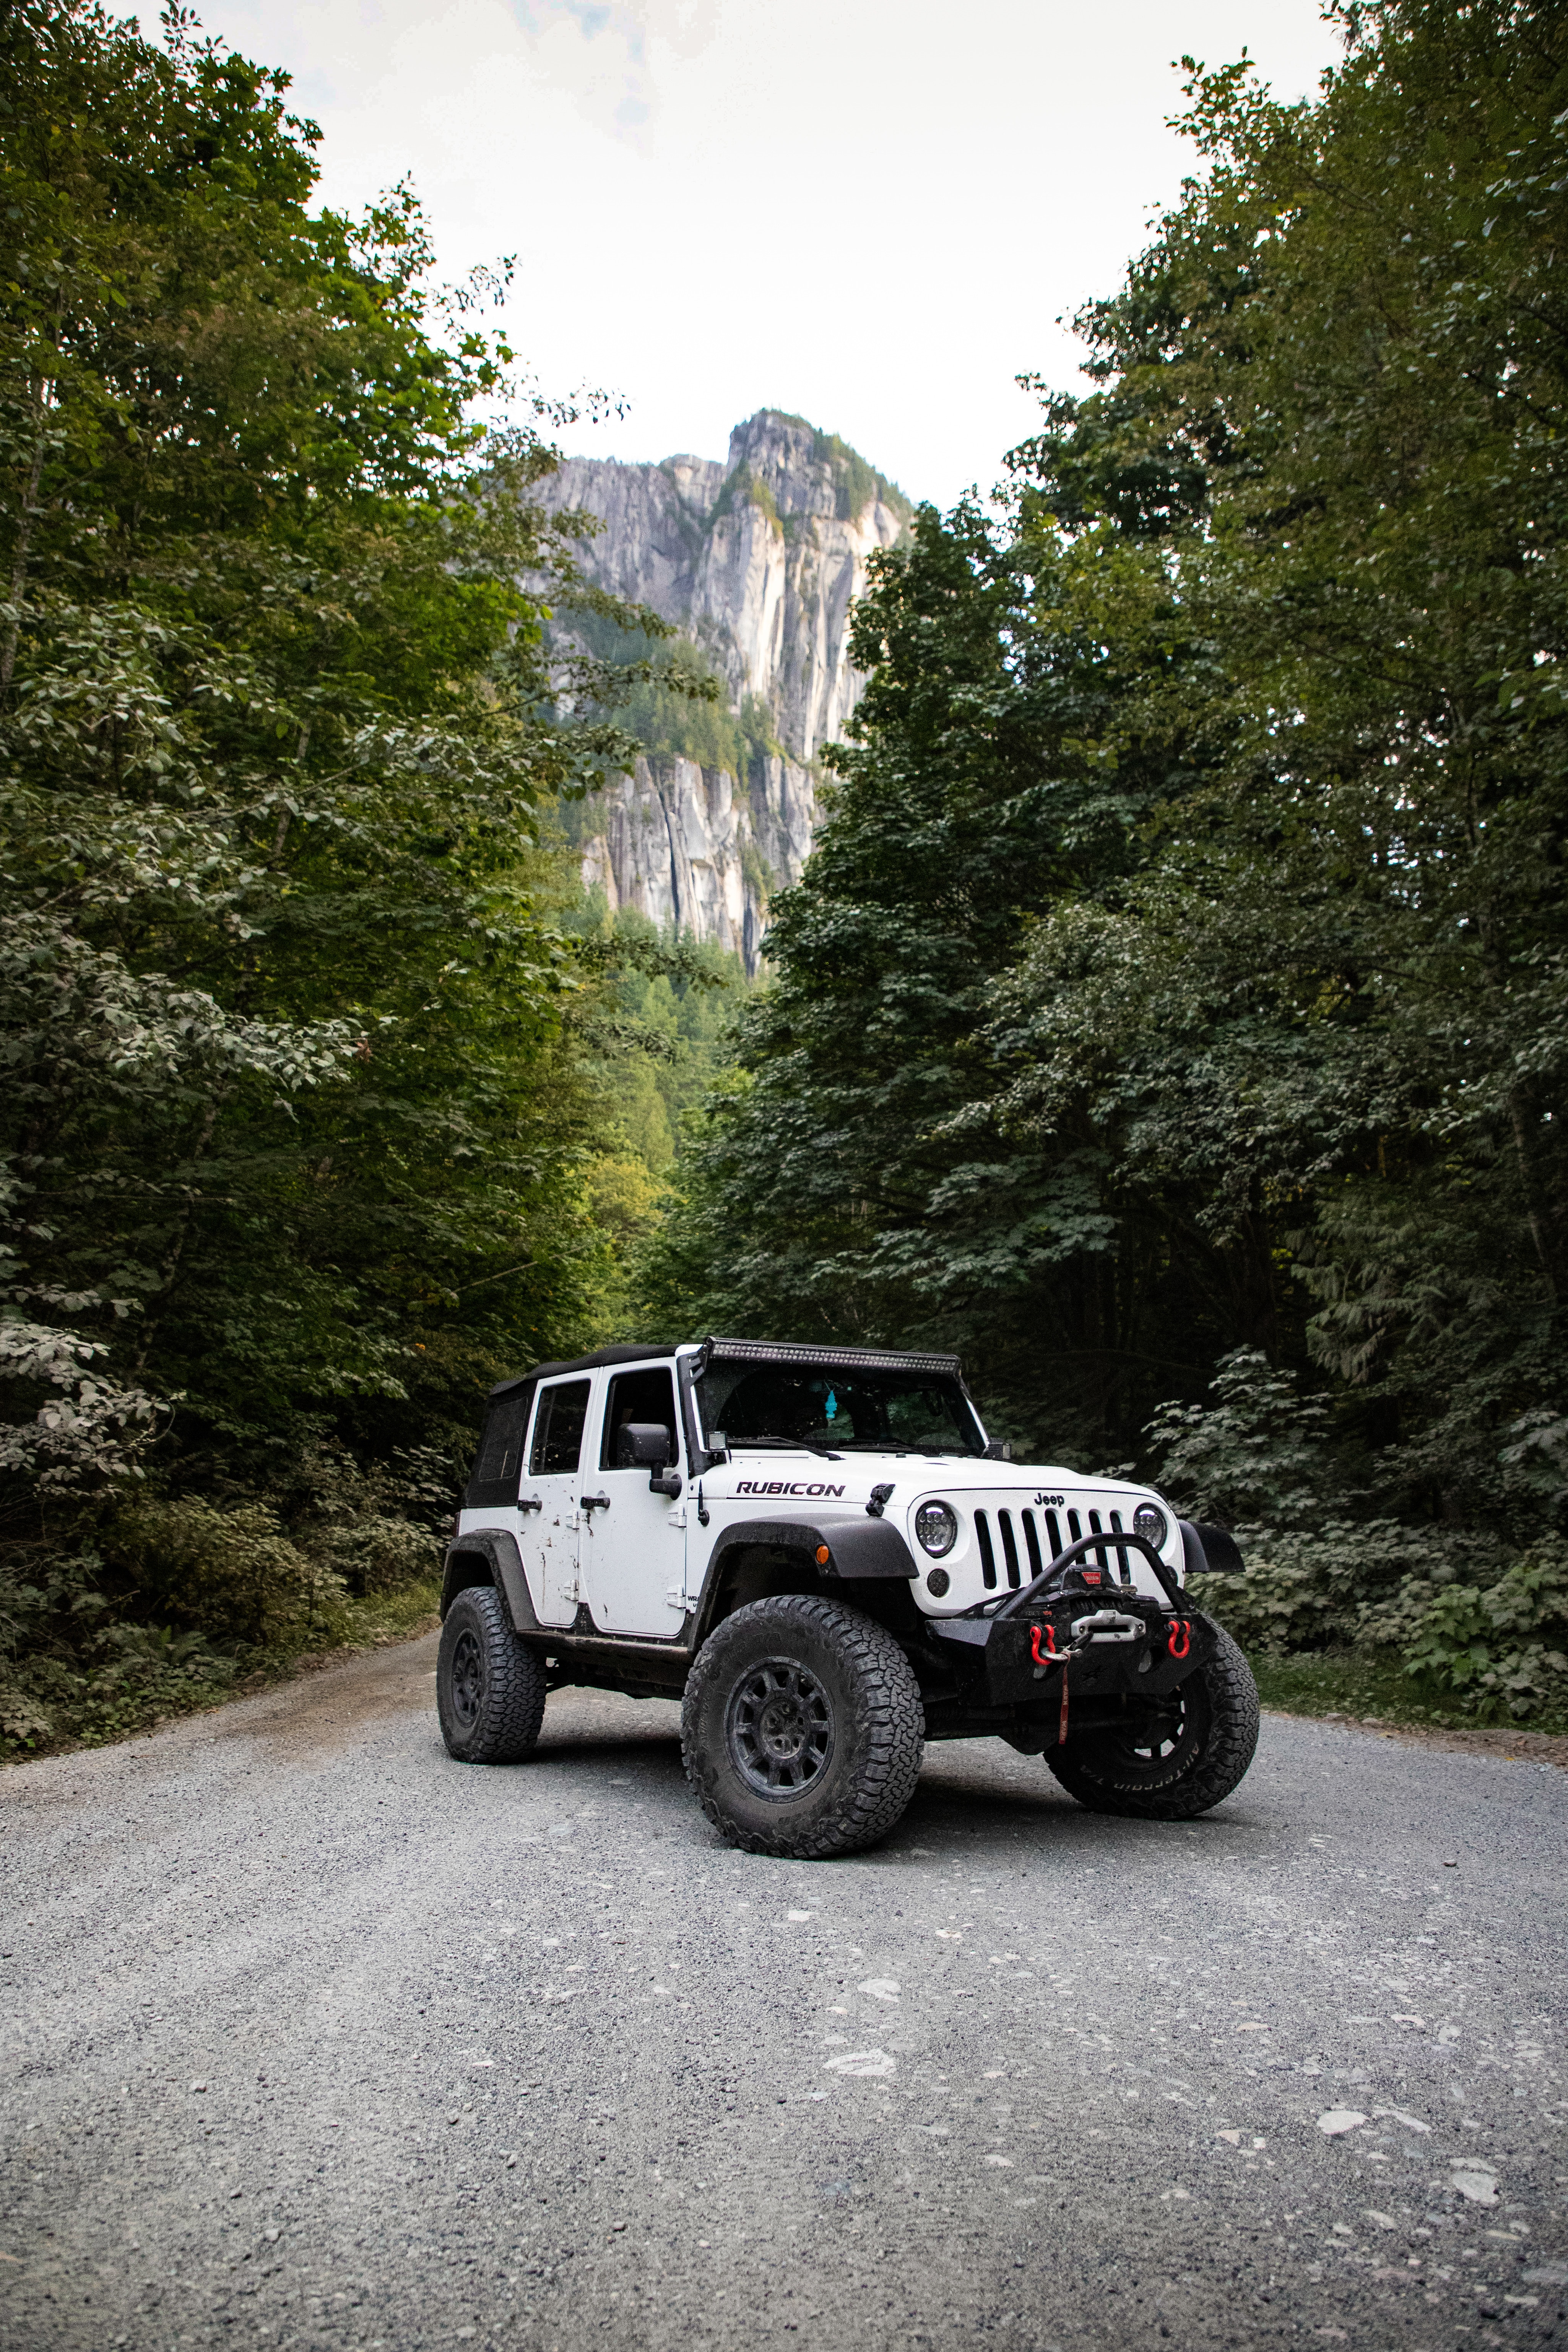 Jeep Wrangler Putih Di Jalan Aspal Foto Stok Gratis